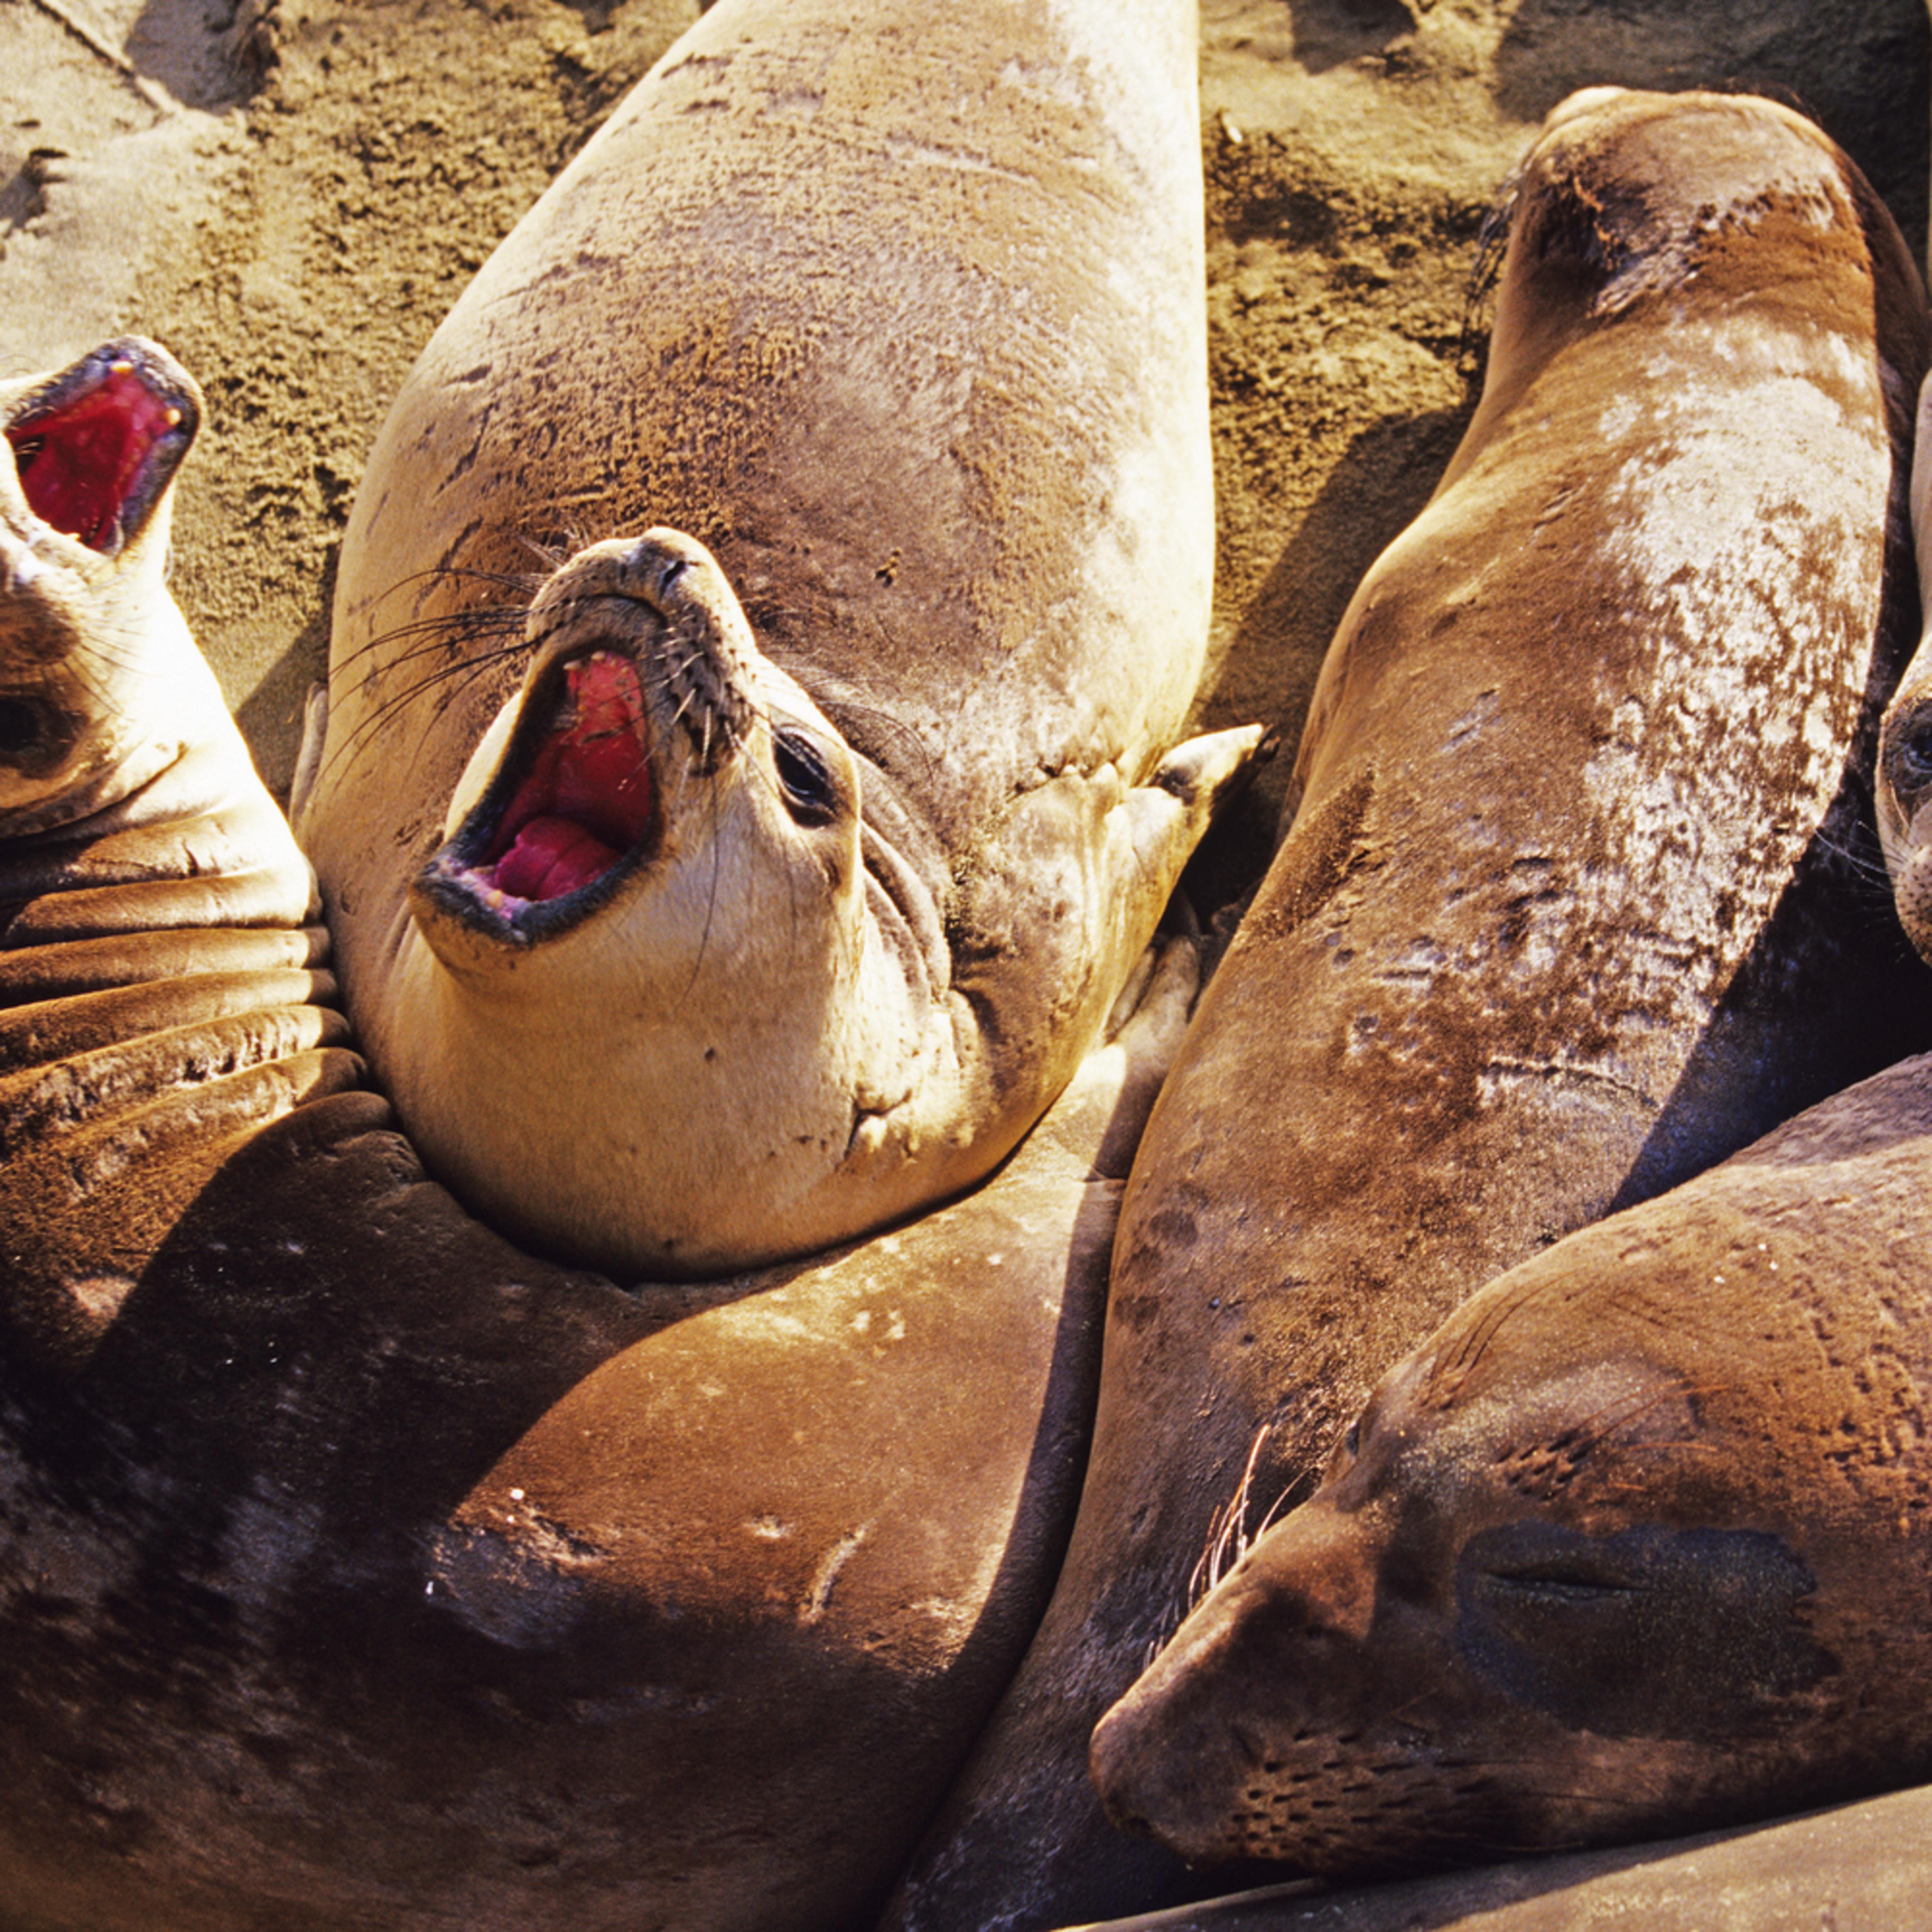 Elephant seals ujp9fg